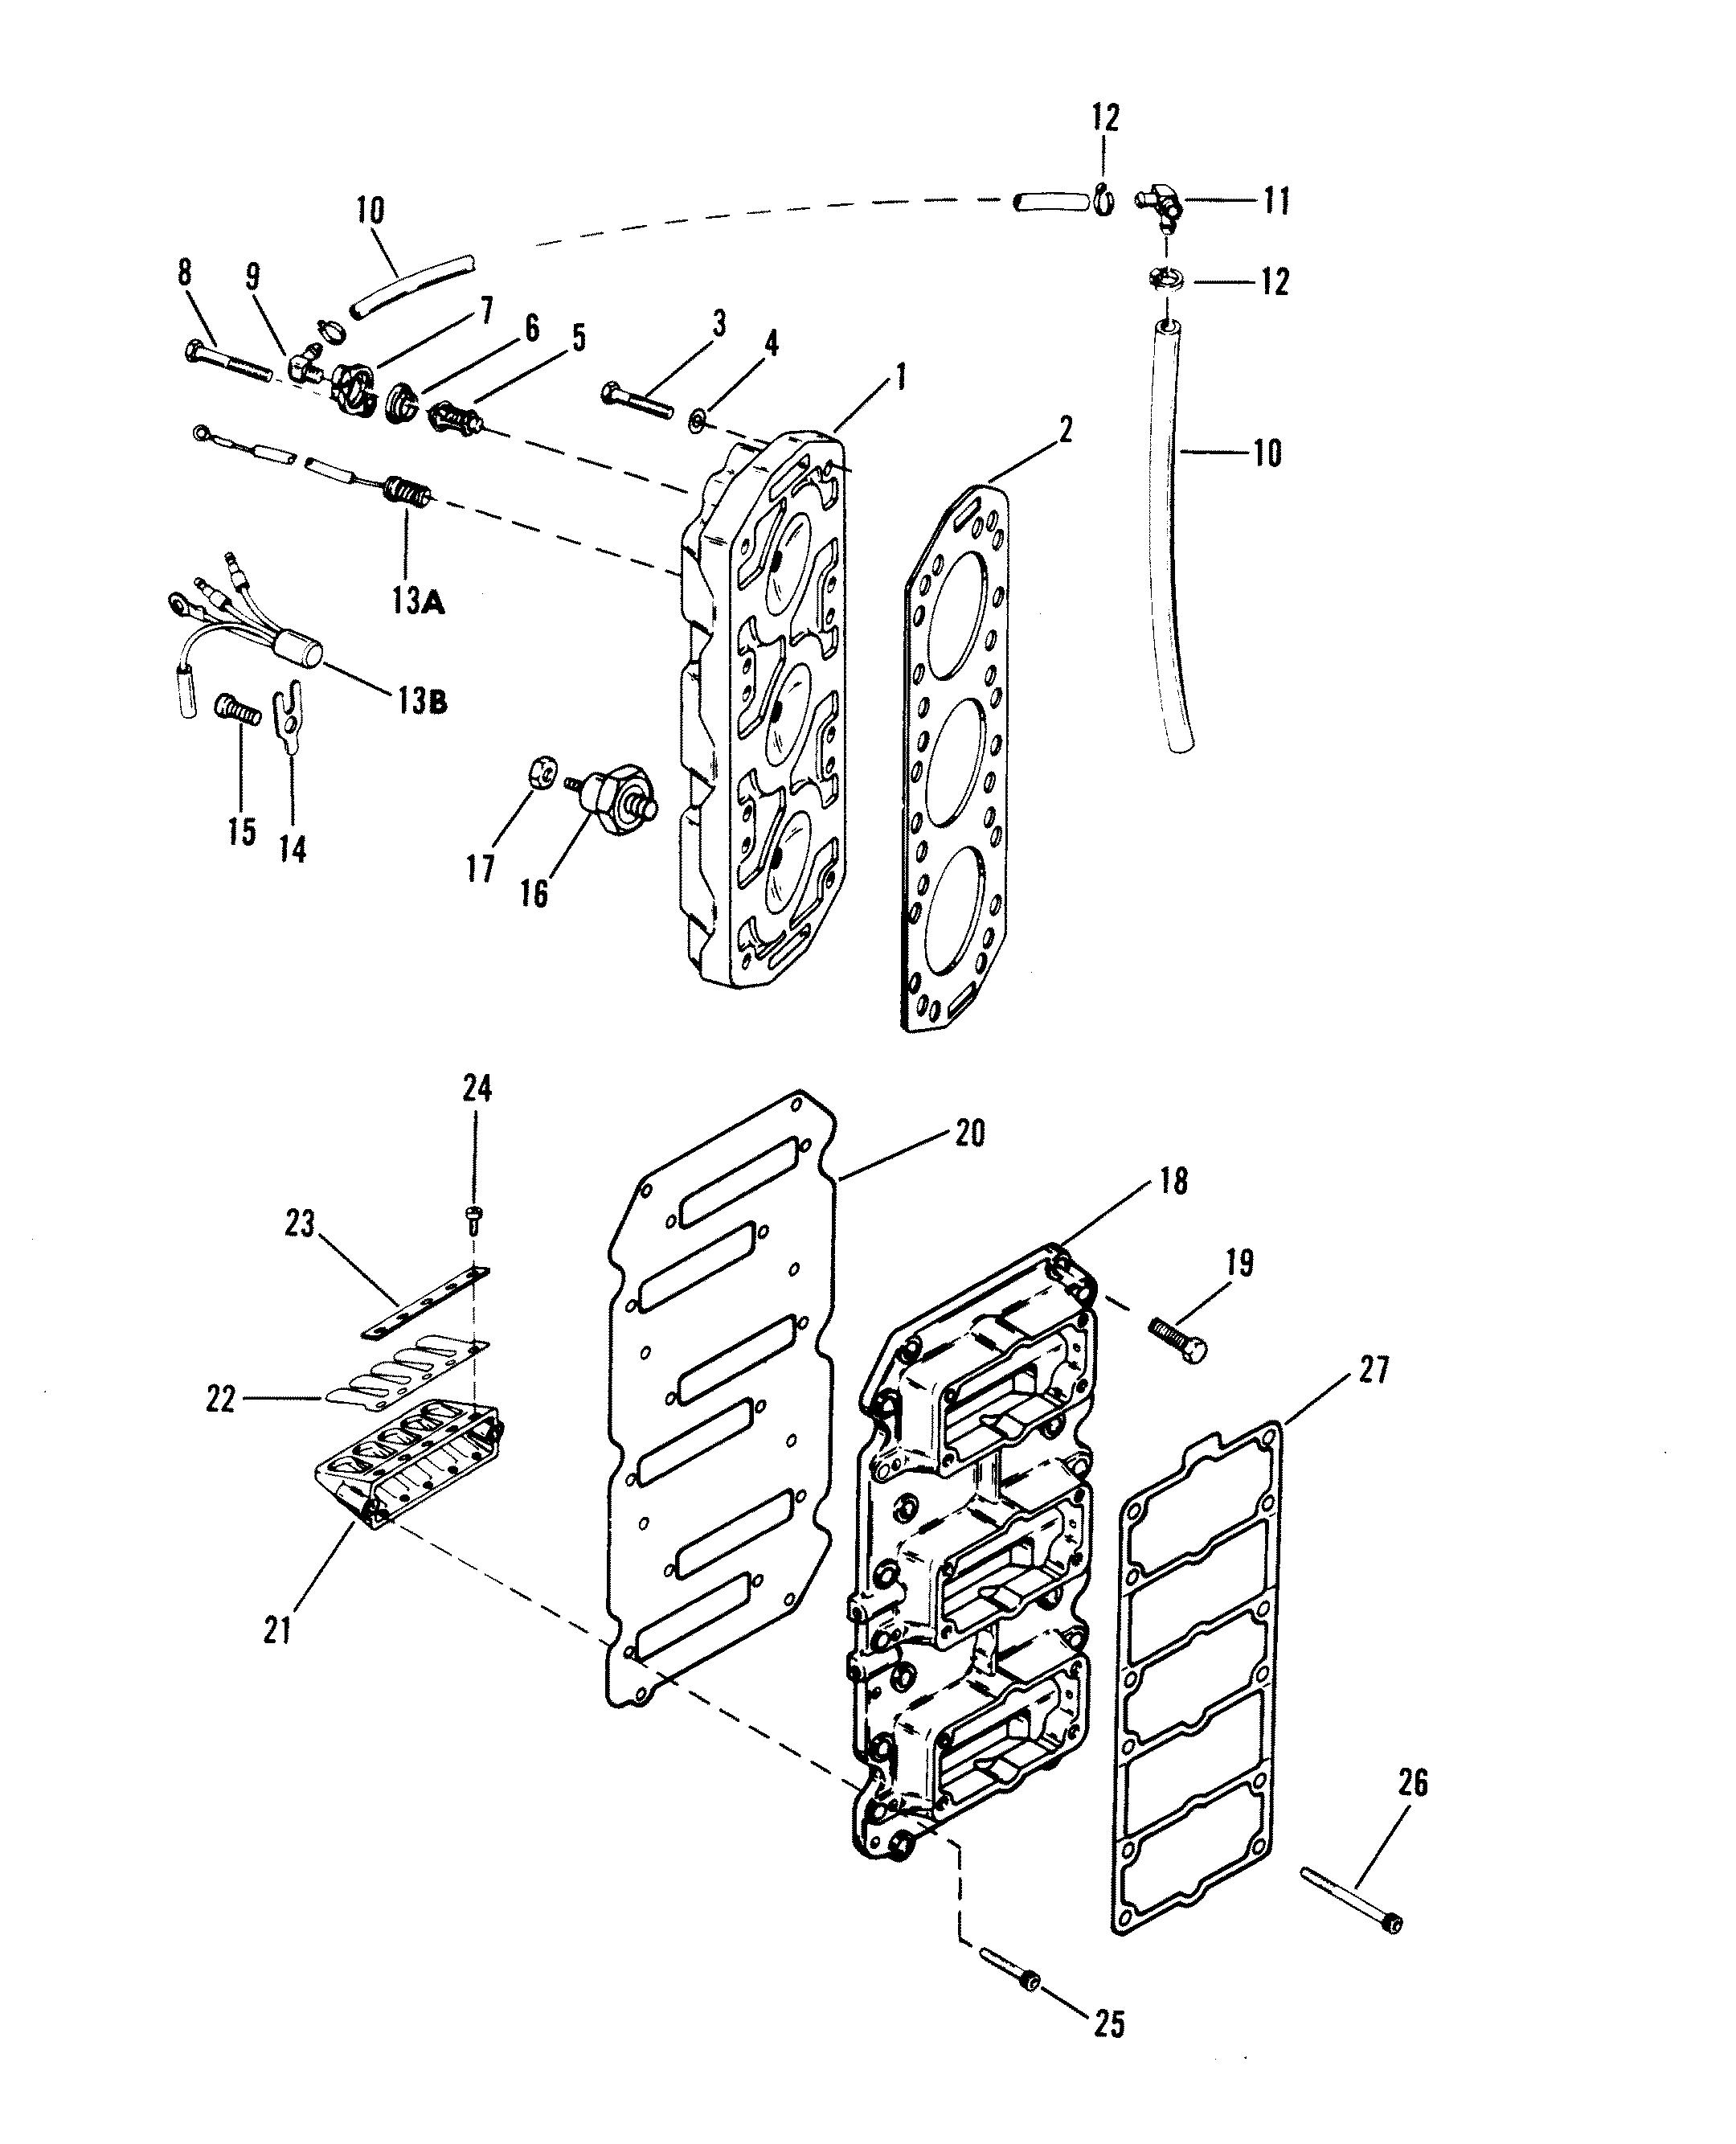 reed block and cylinder head for mercury 200 xri efi v